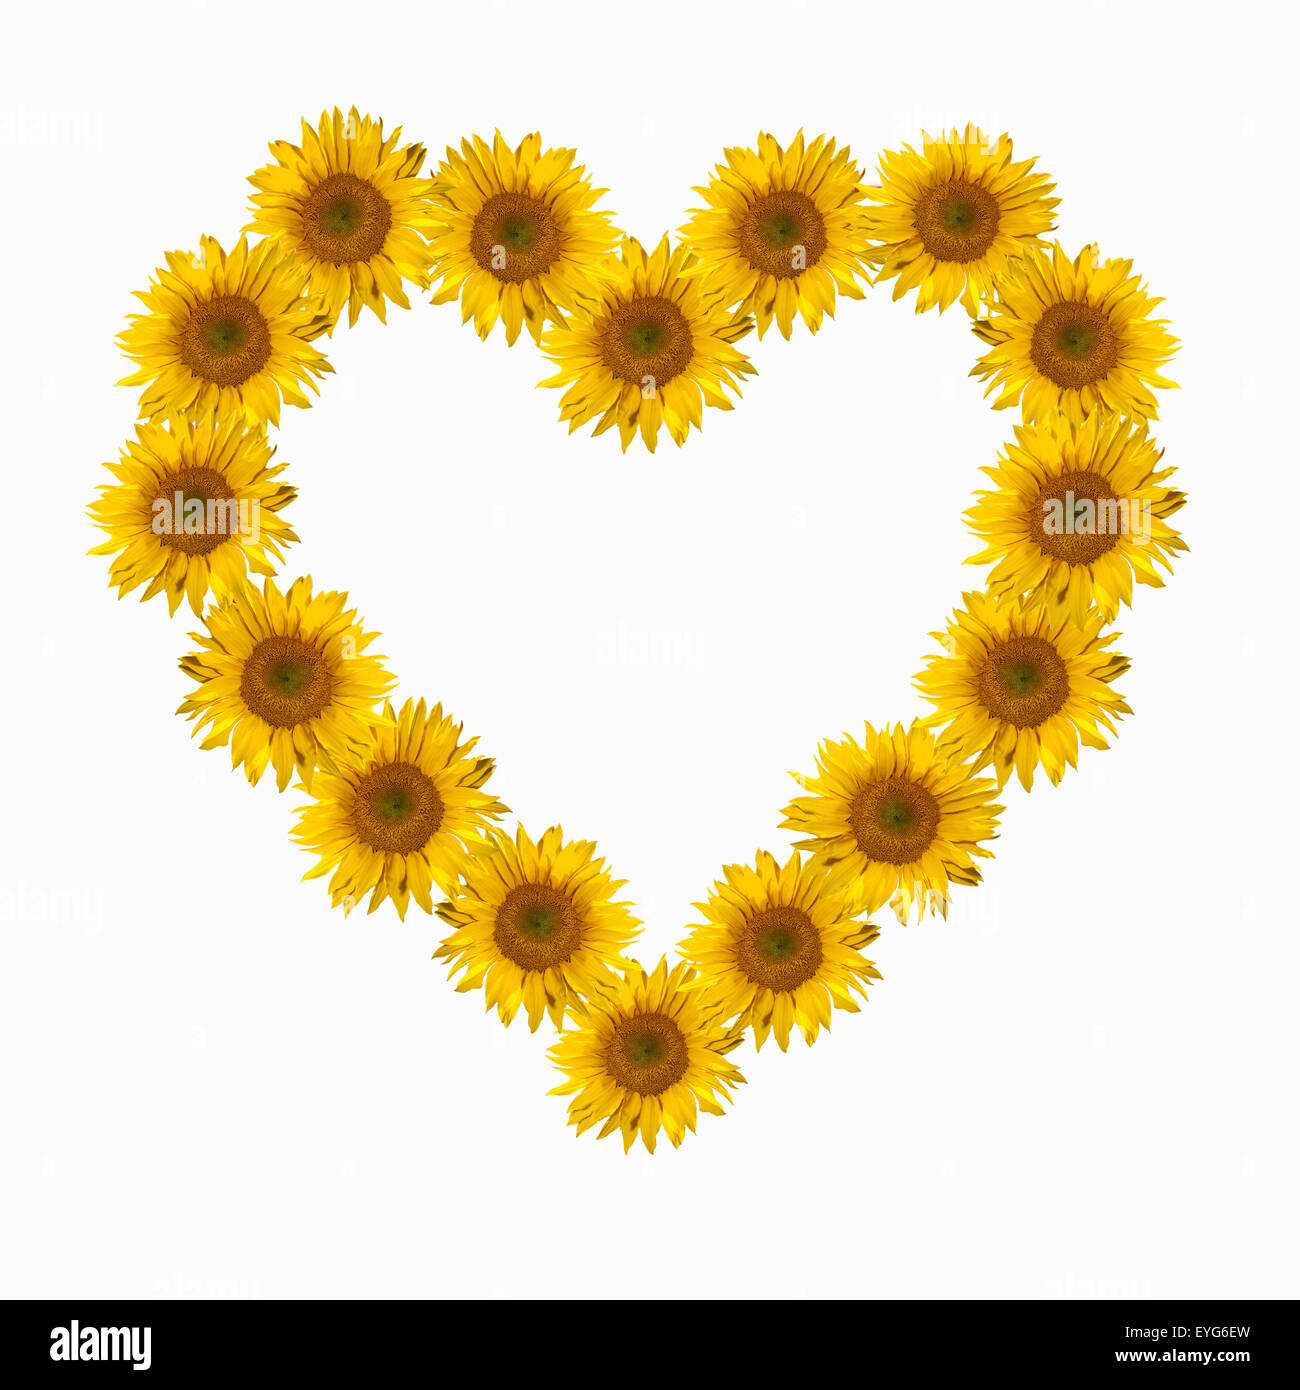 Blumenherz, Sonnenblume, Helianthus, annuus, - Stock Image